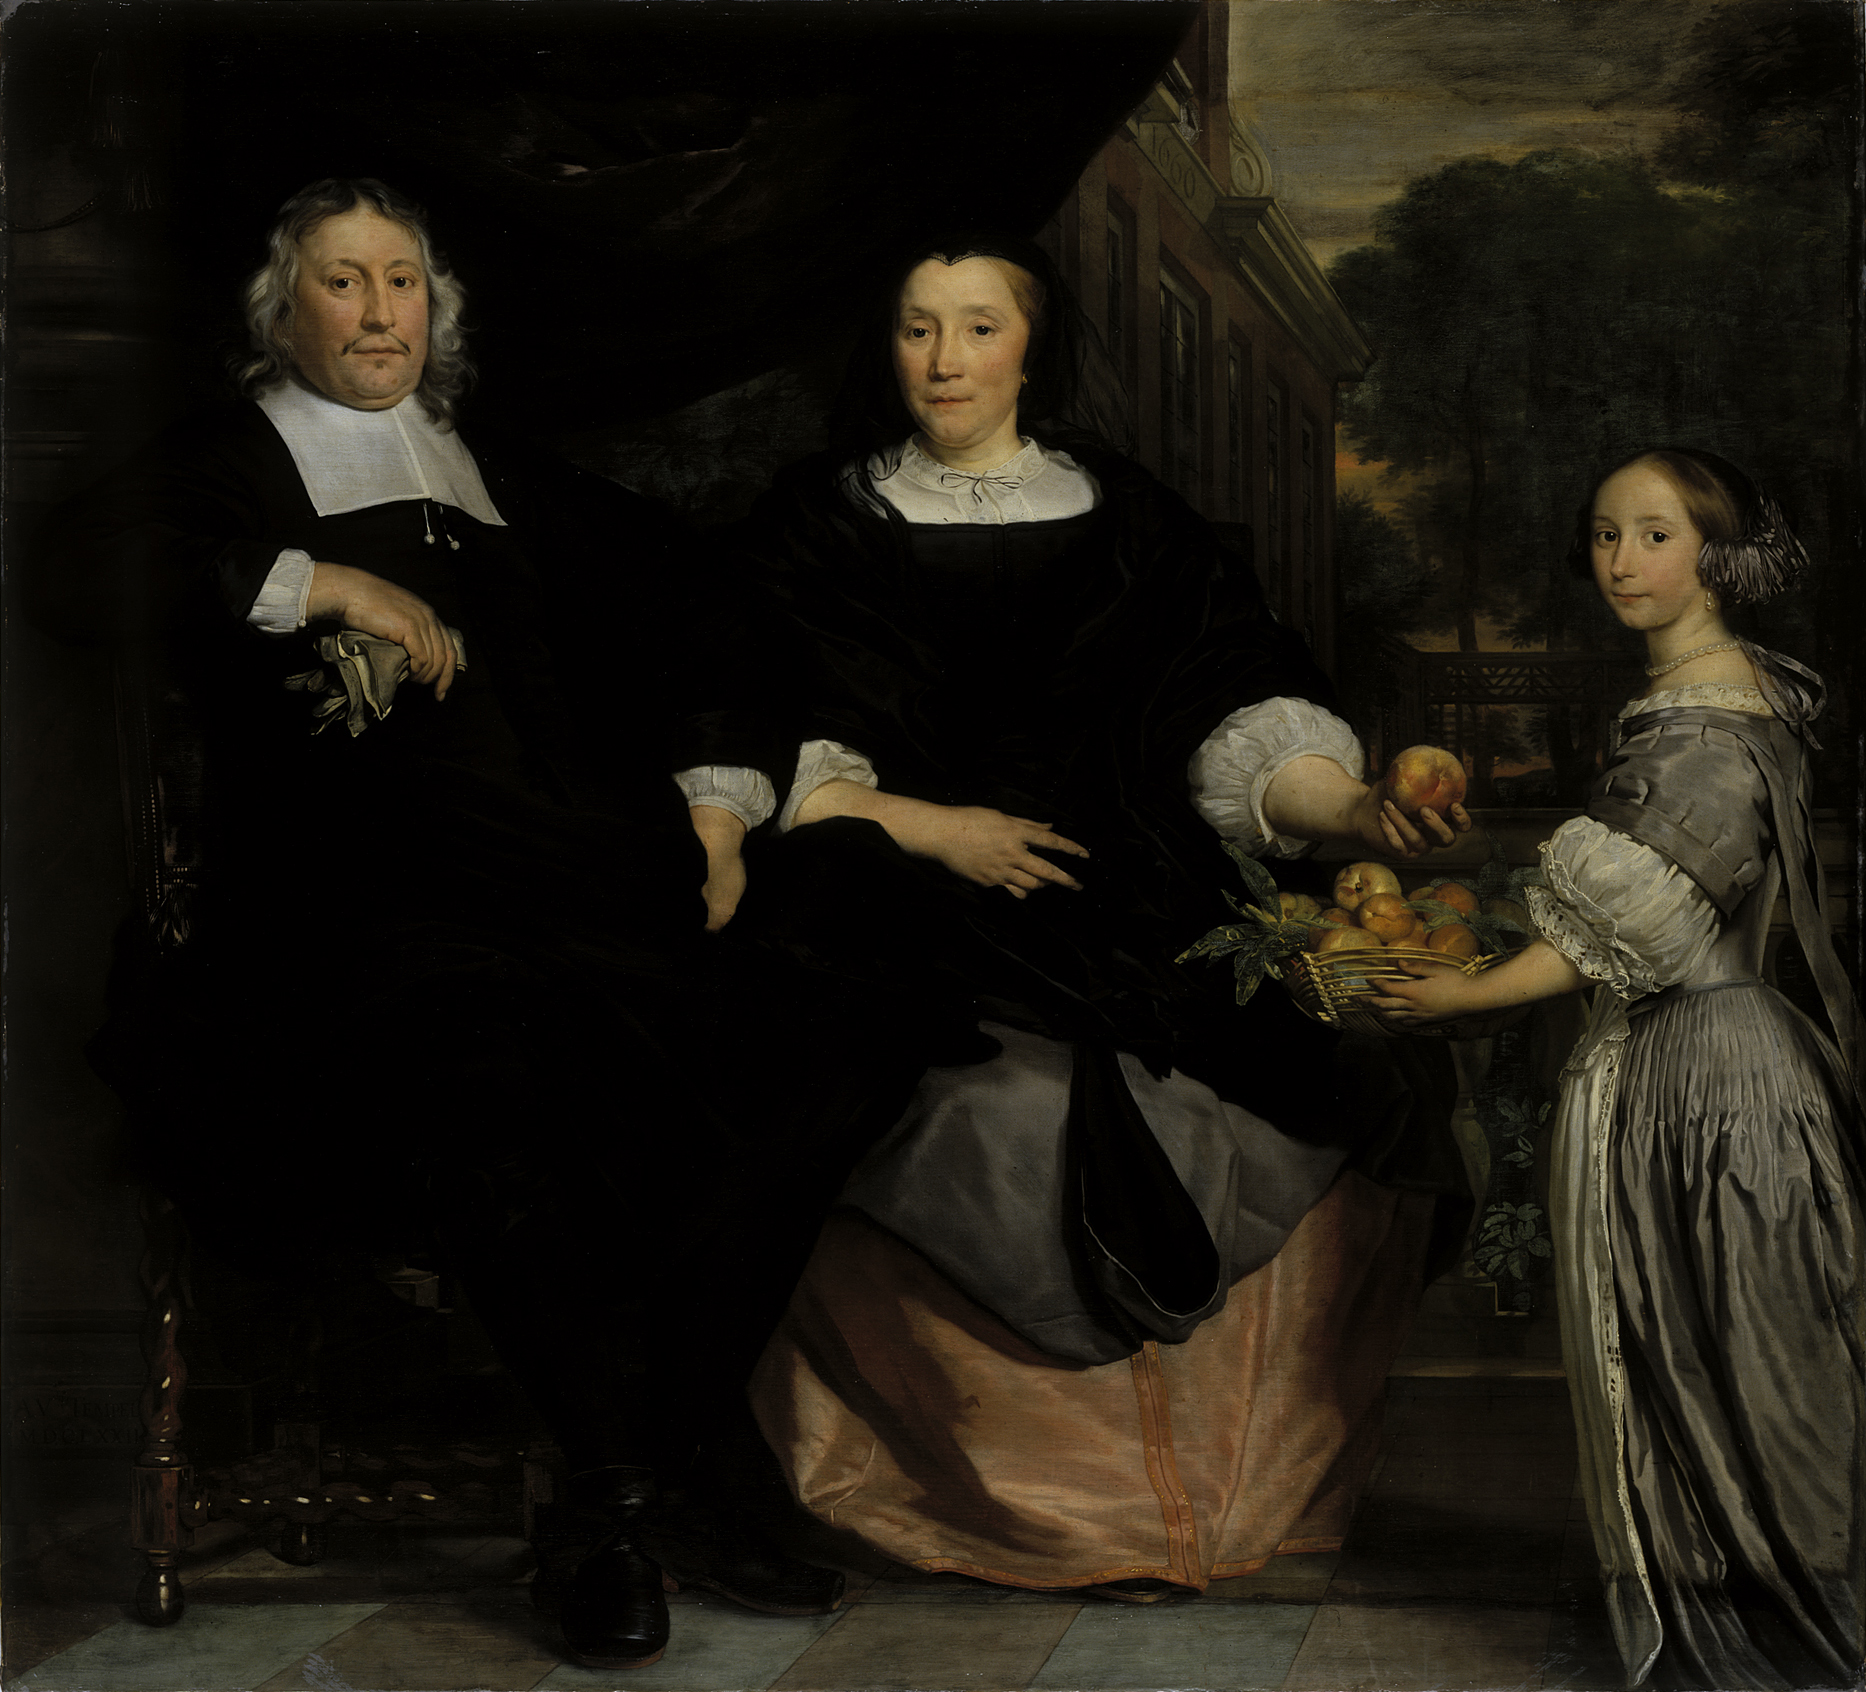 Abraham Lambertsz. van den Tempel (1622/23 - 1672): Bildnis einer Patrizierfamilie, 1672 © Hamburger Kunsthalle / bpk, Foto: Elke Walford / bpk, Foto: Elke Walford